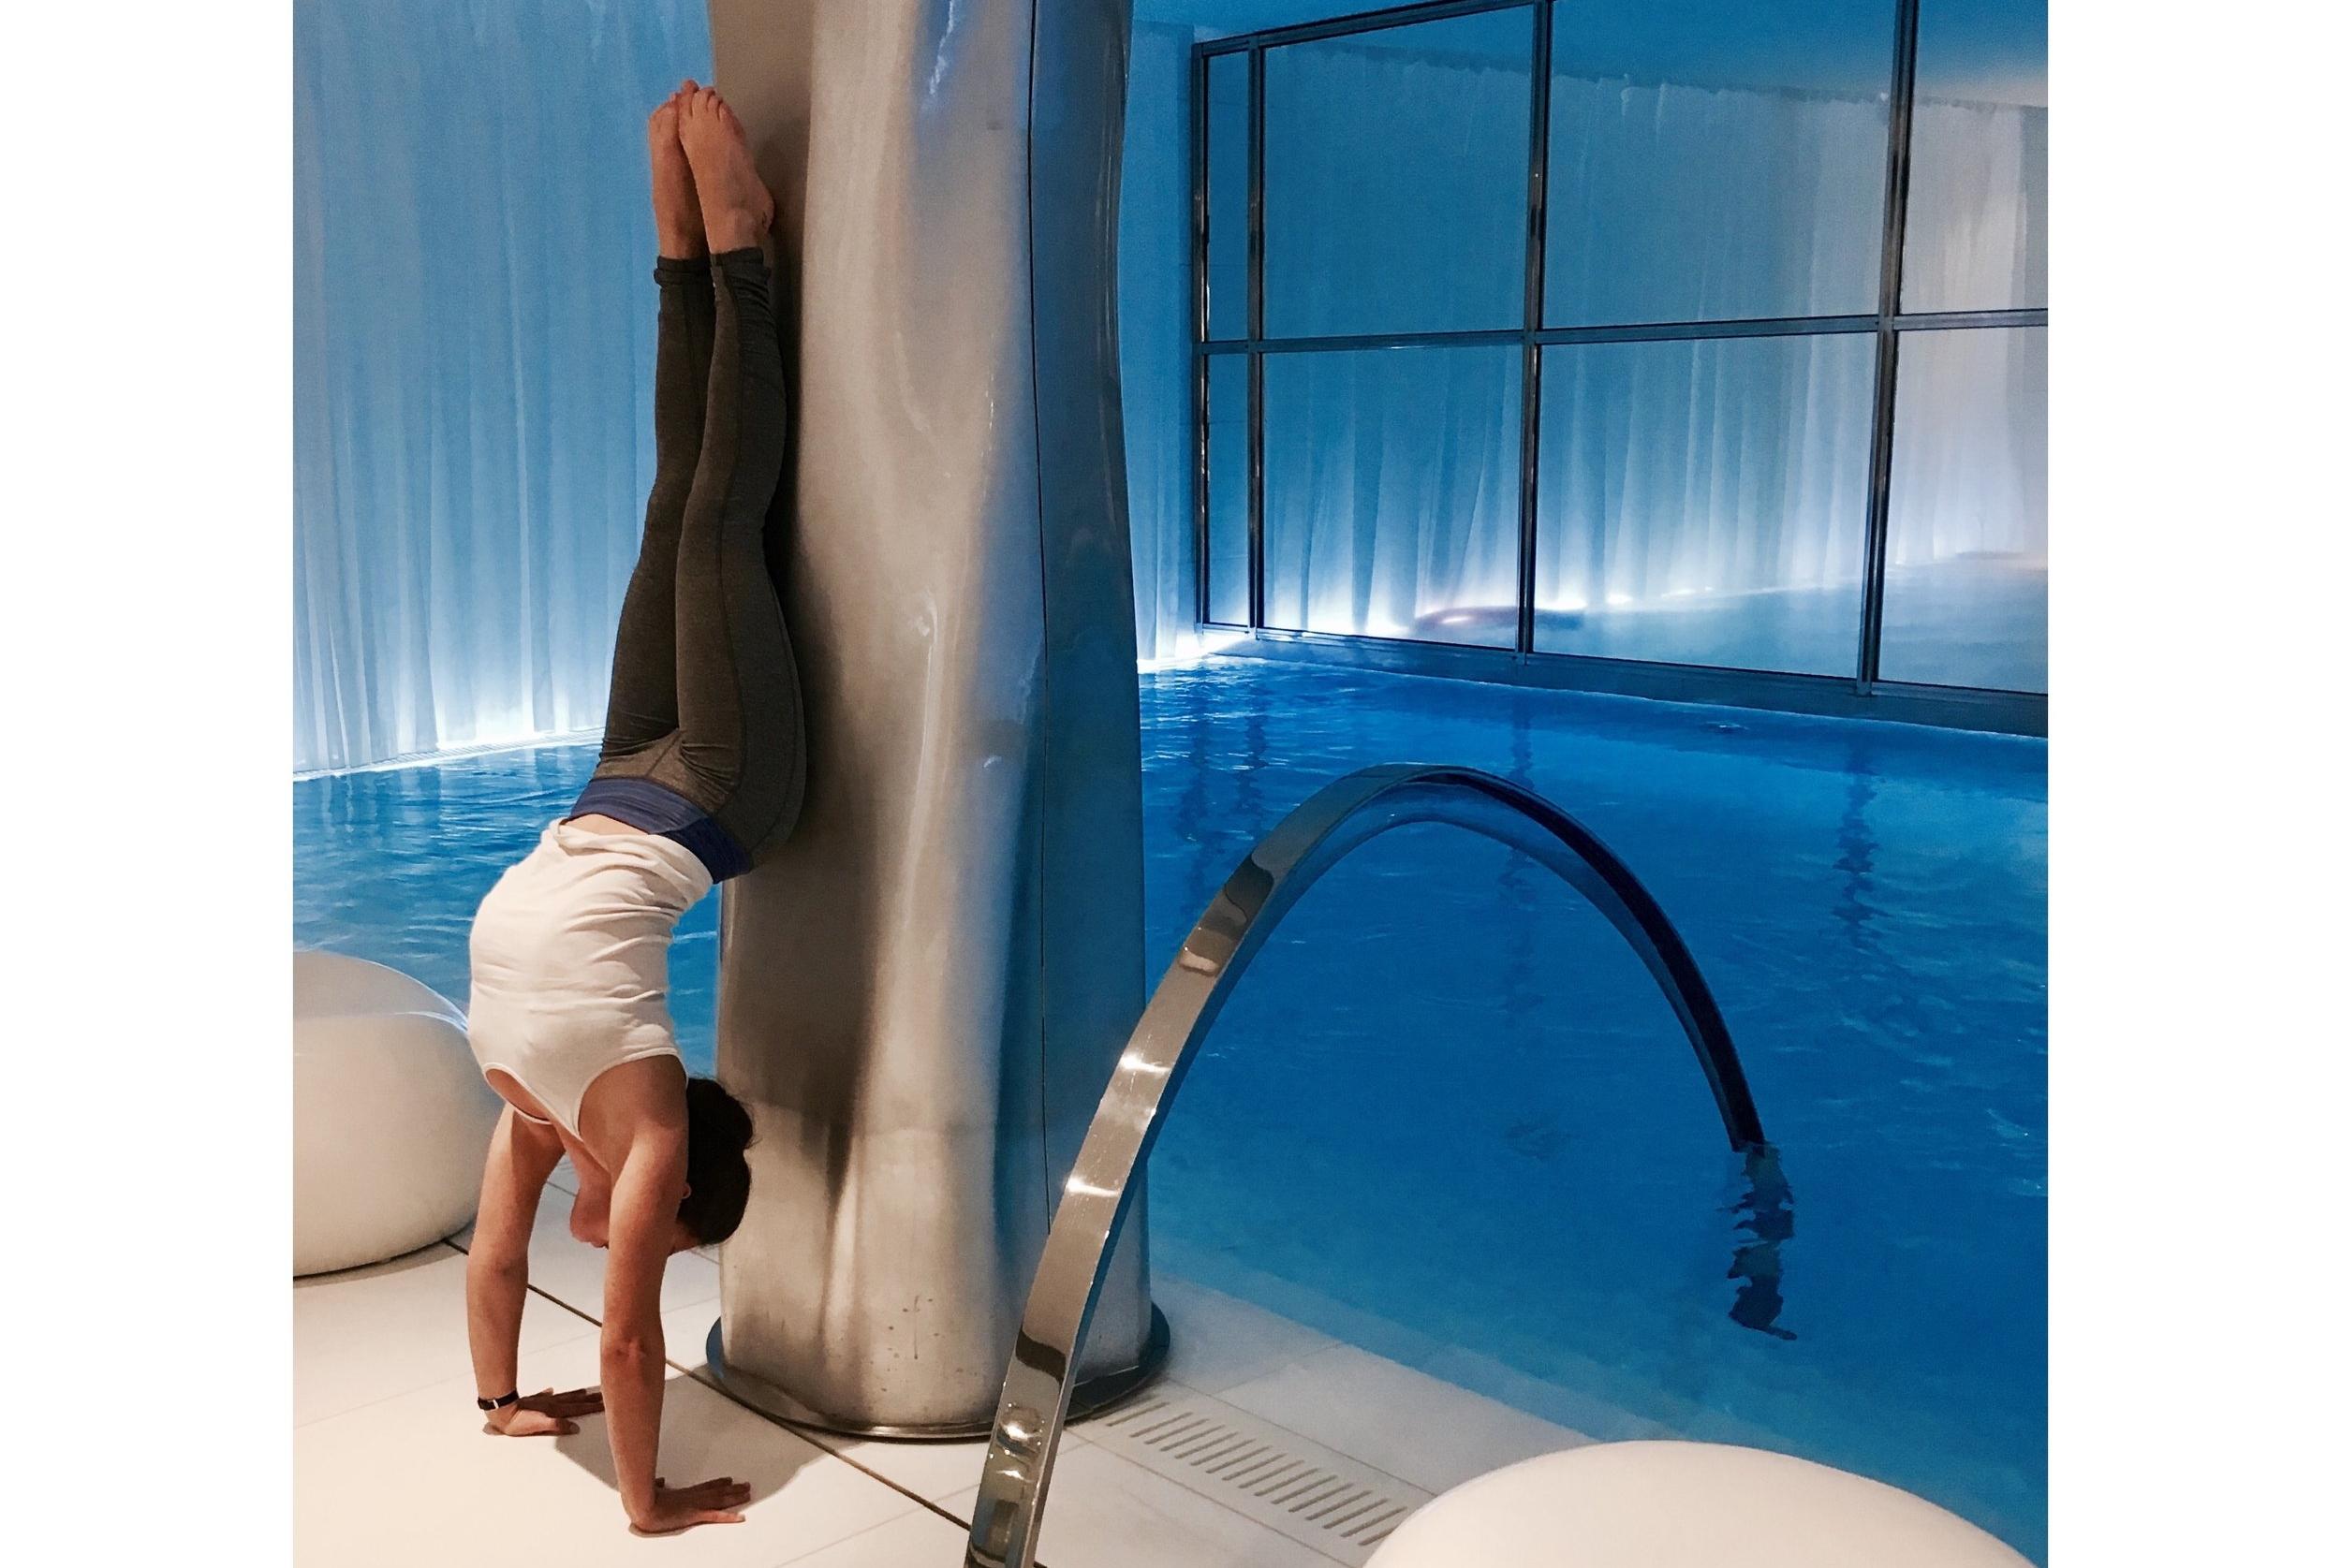 Teaching Yoga @LeRoyalMonceauParis